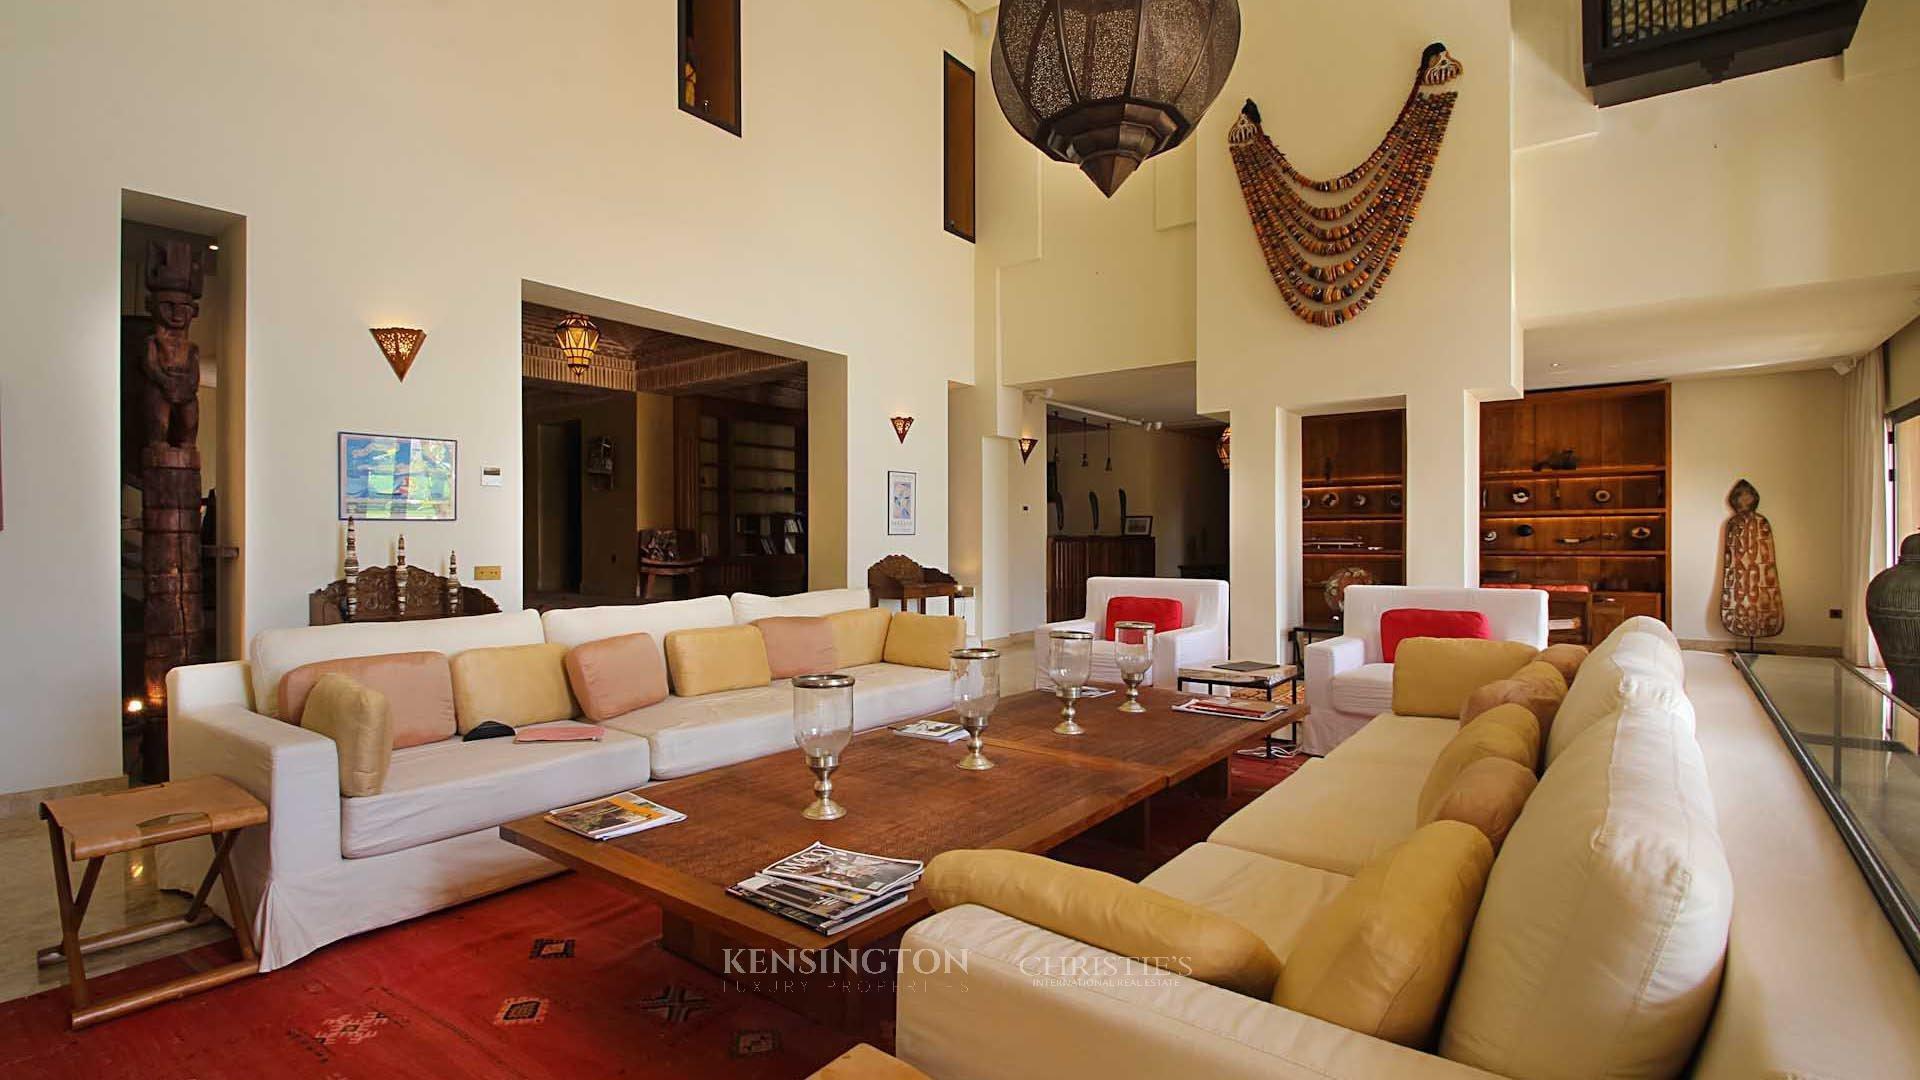 KPPM01075: Villa Jana Luxury Villa Marrakech Morocco